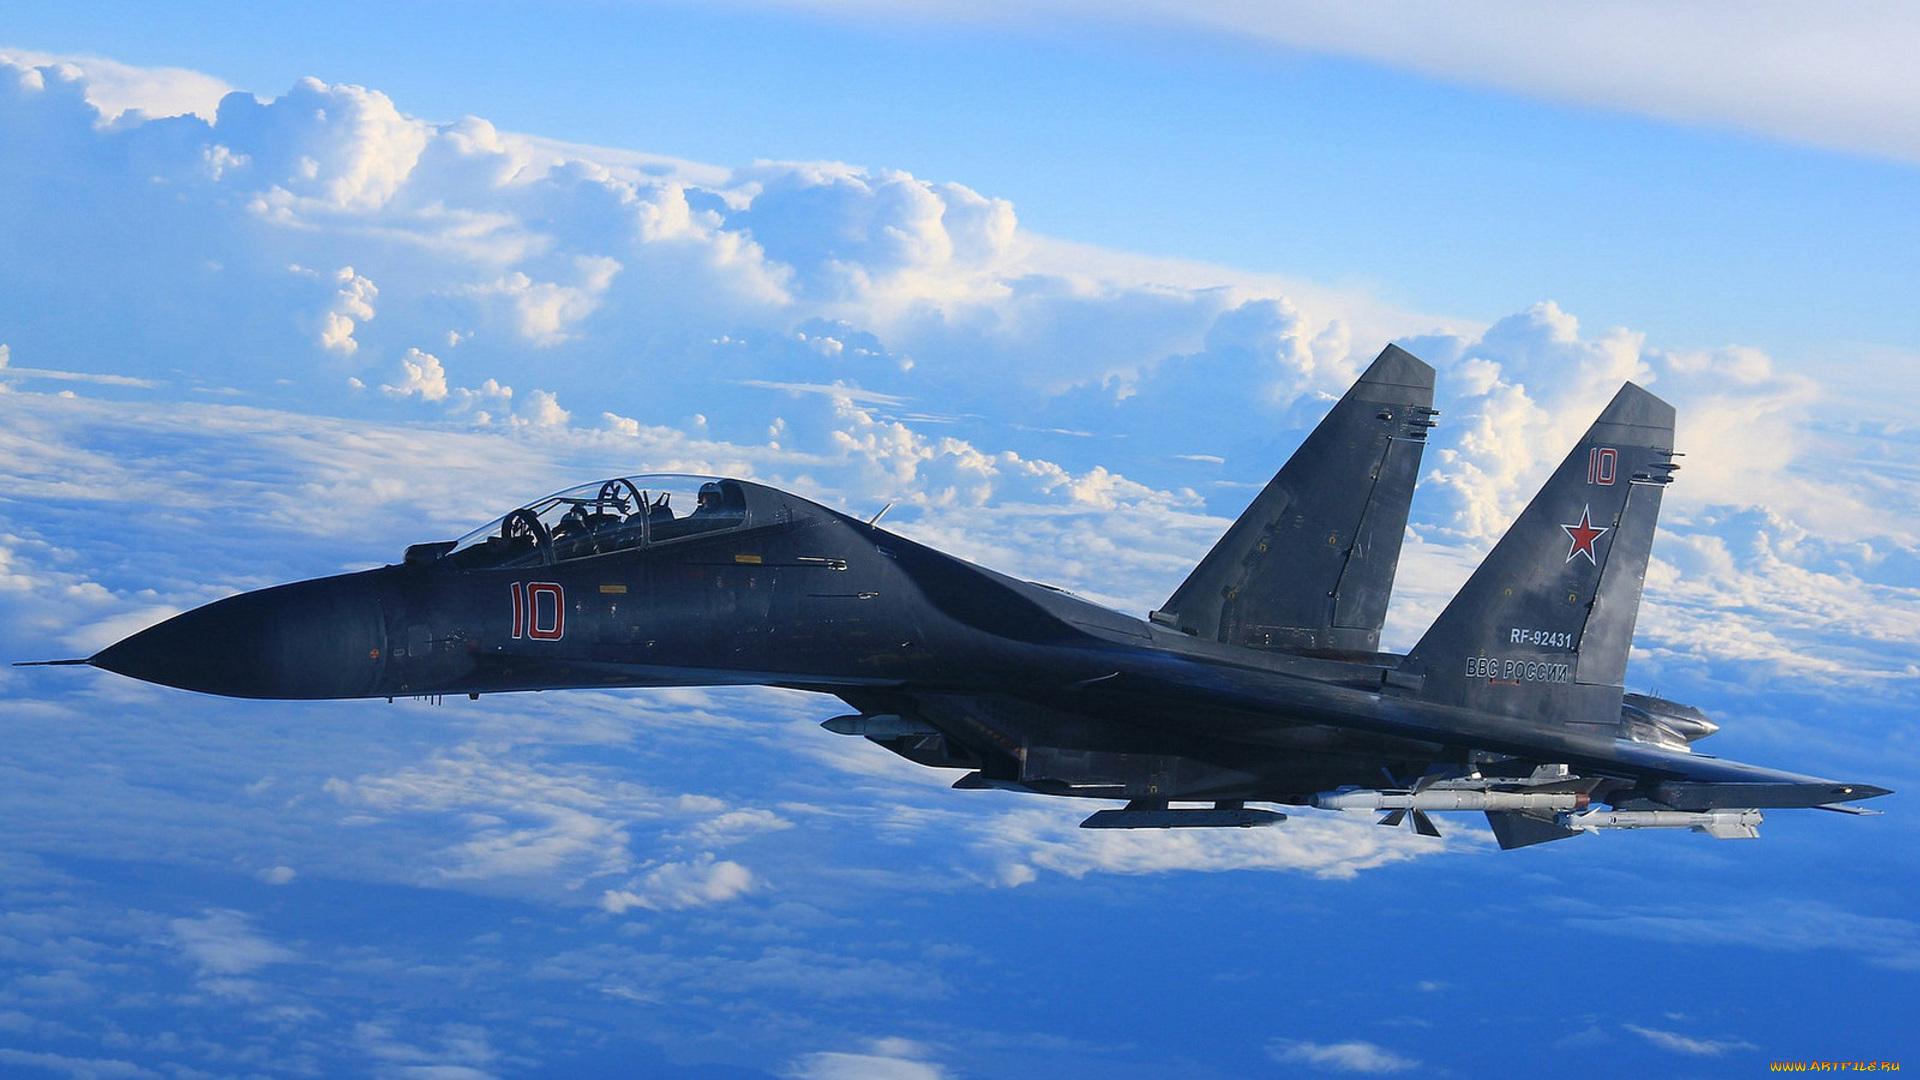 Обои Облака, полет, истребители. Авиация foto 18